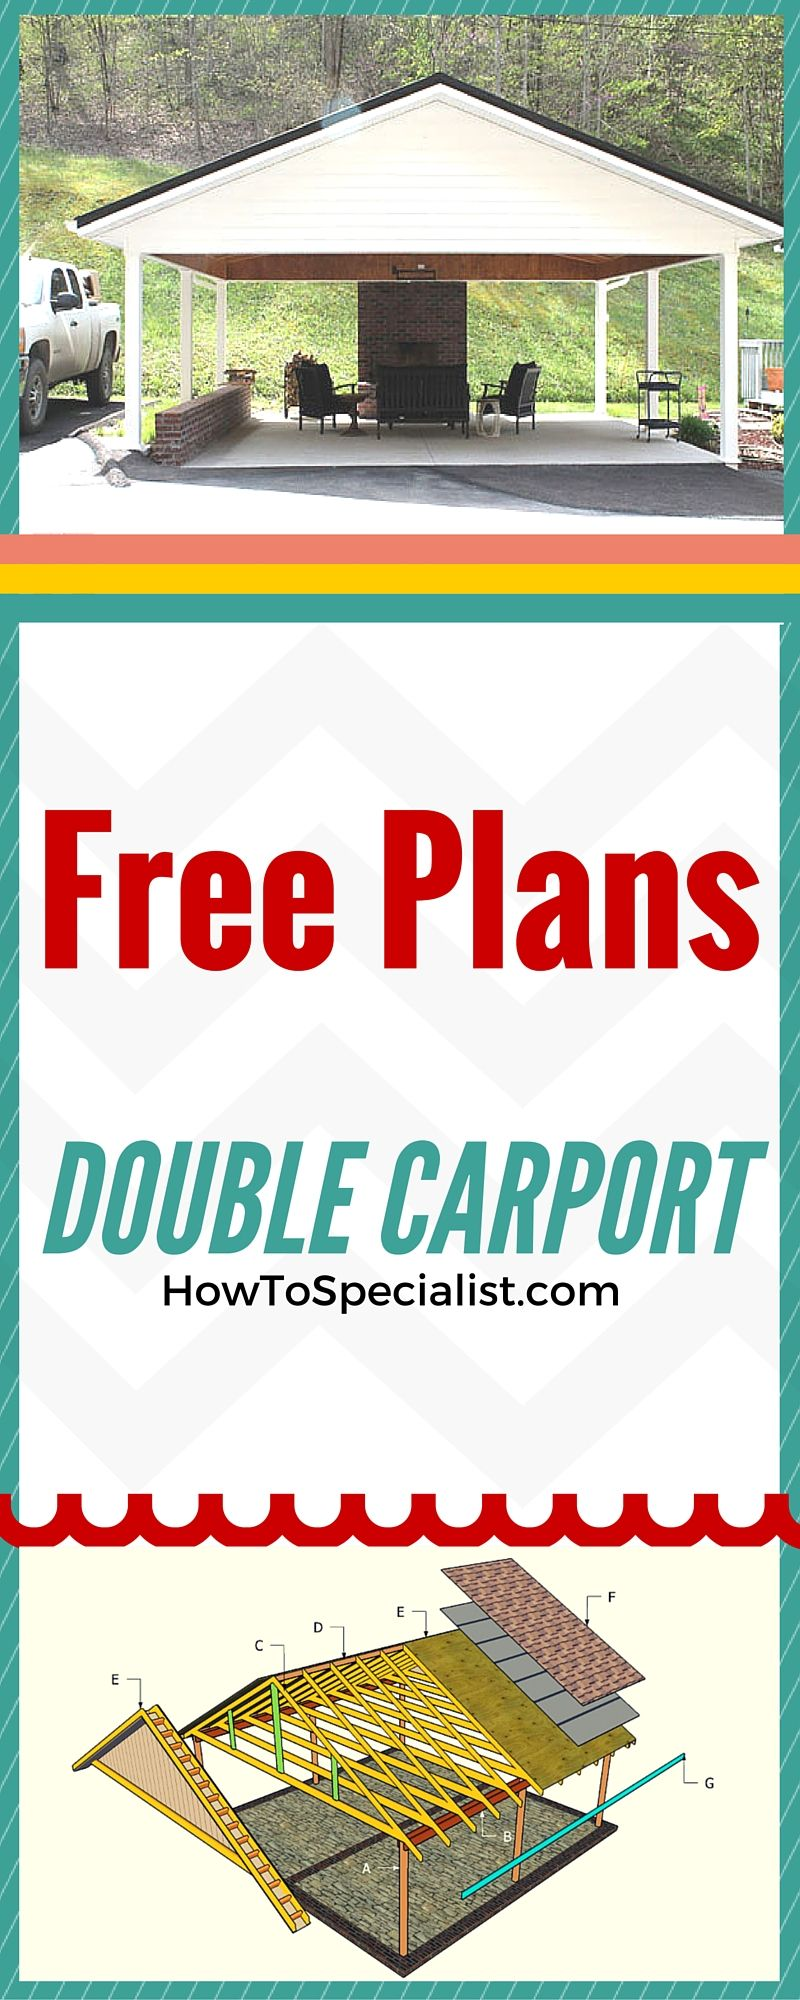 How to build a double carport Double carport, Building a